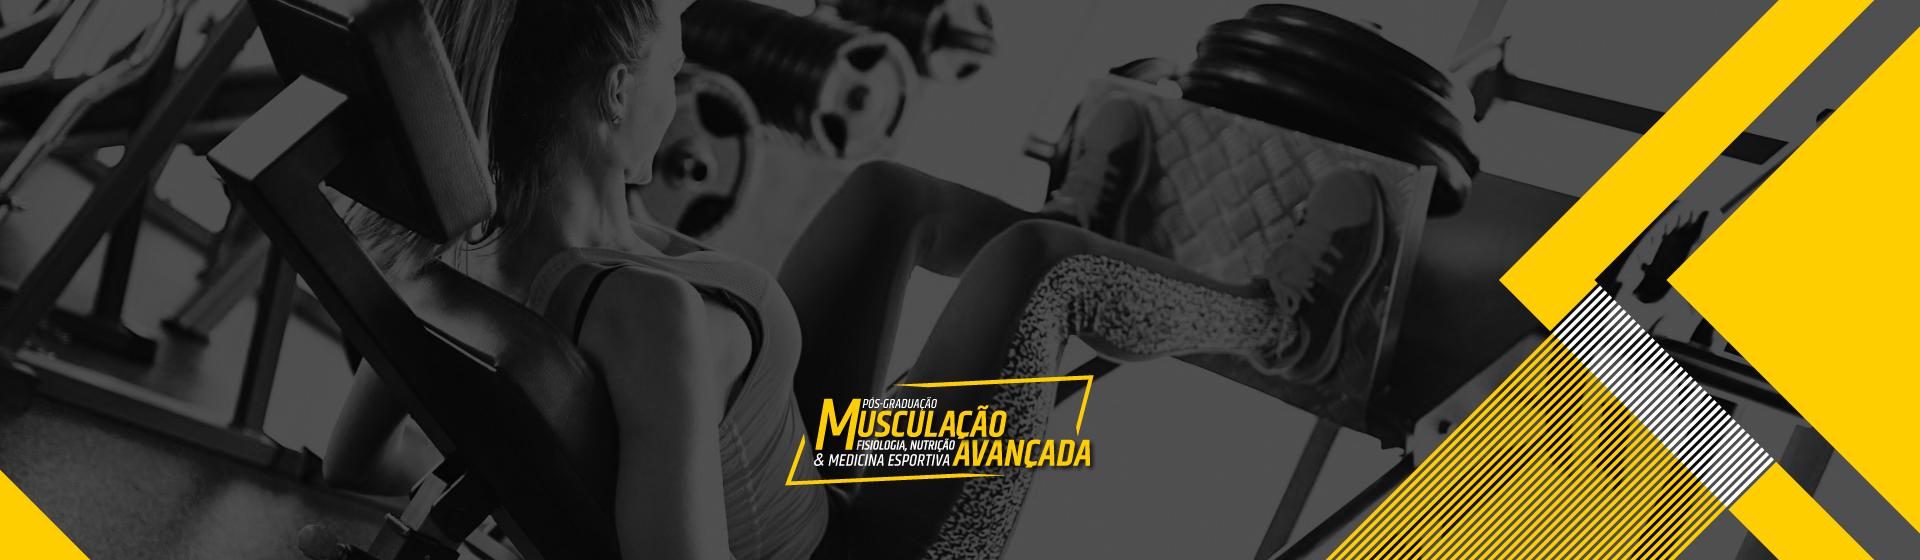 Musculacao avancada 1920x560